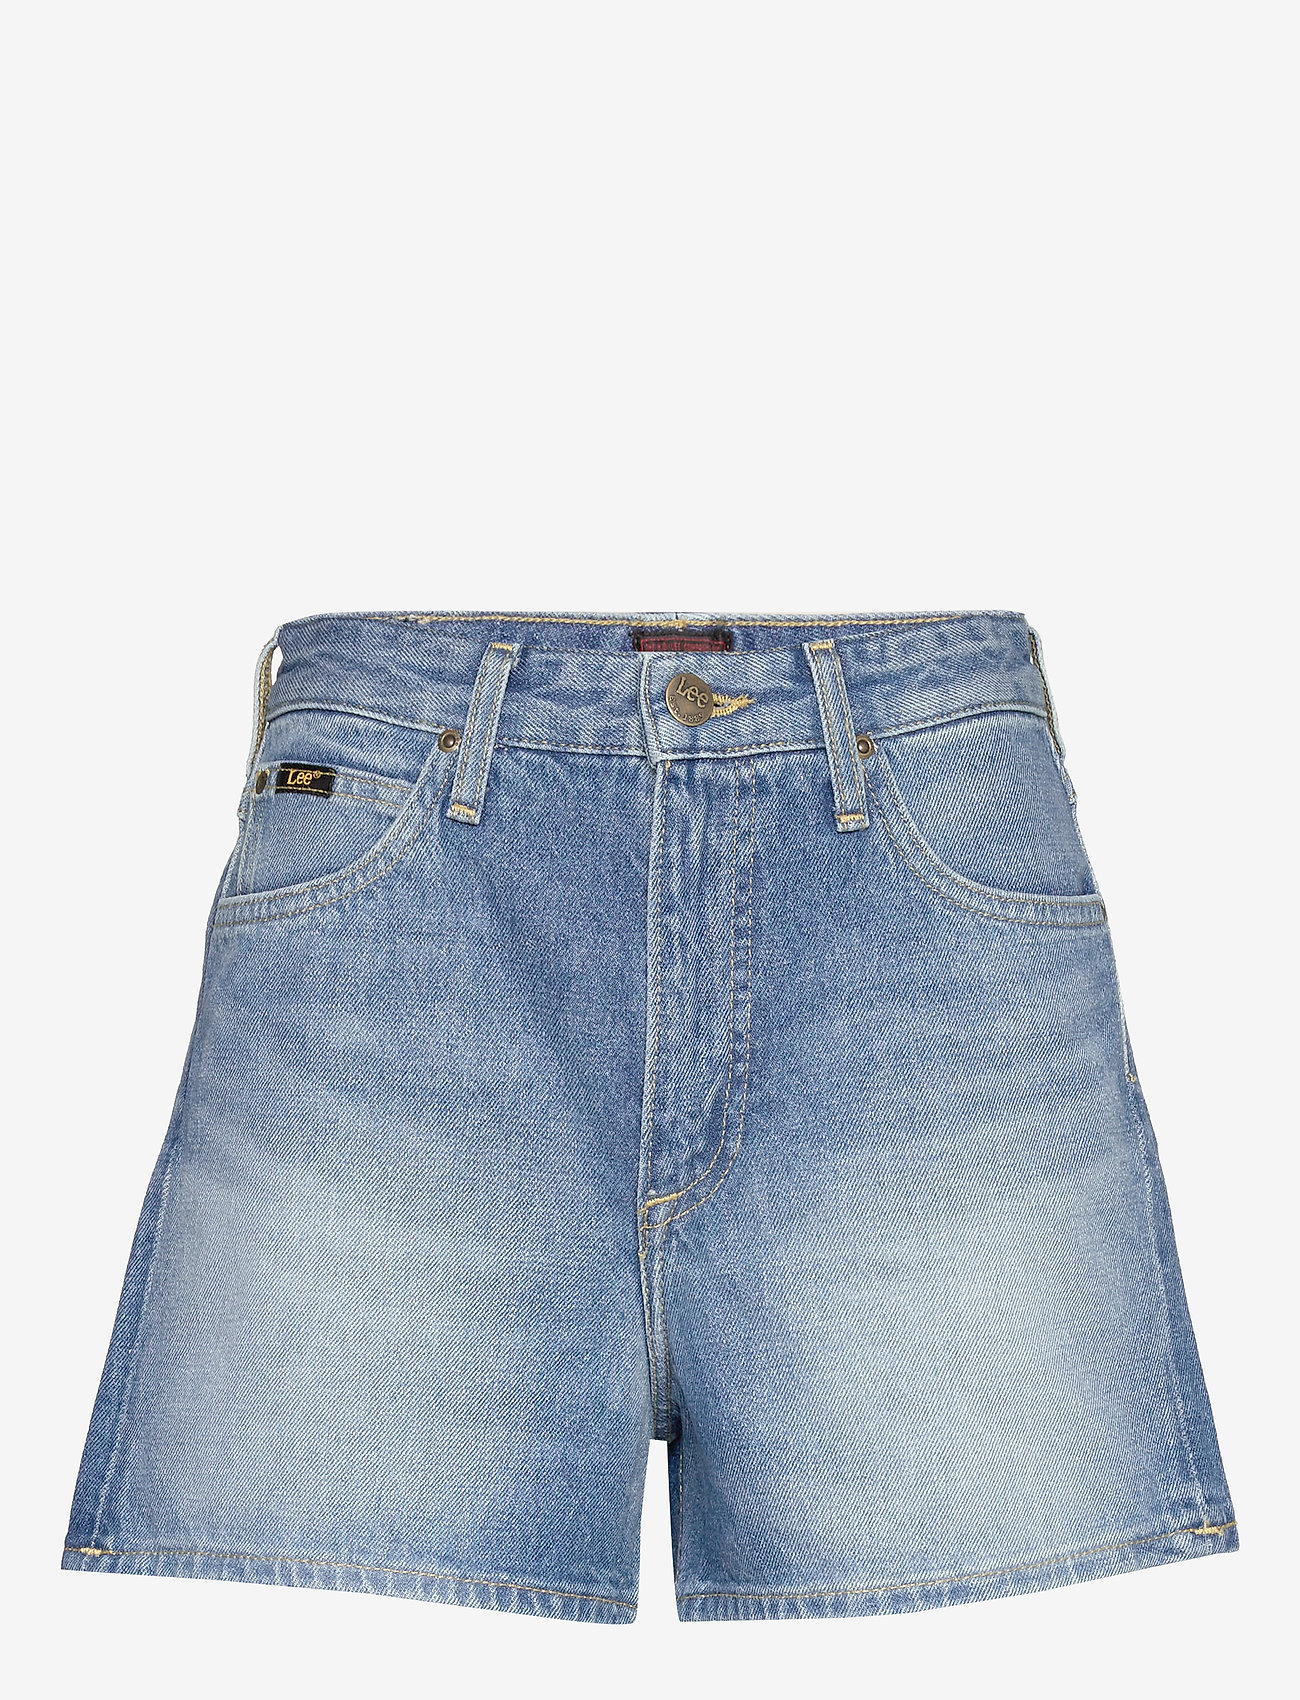 Lee Jeans - THELMA SHORT - denimshorts - worn callie - 0